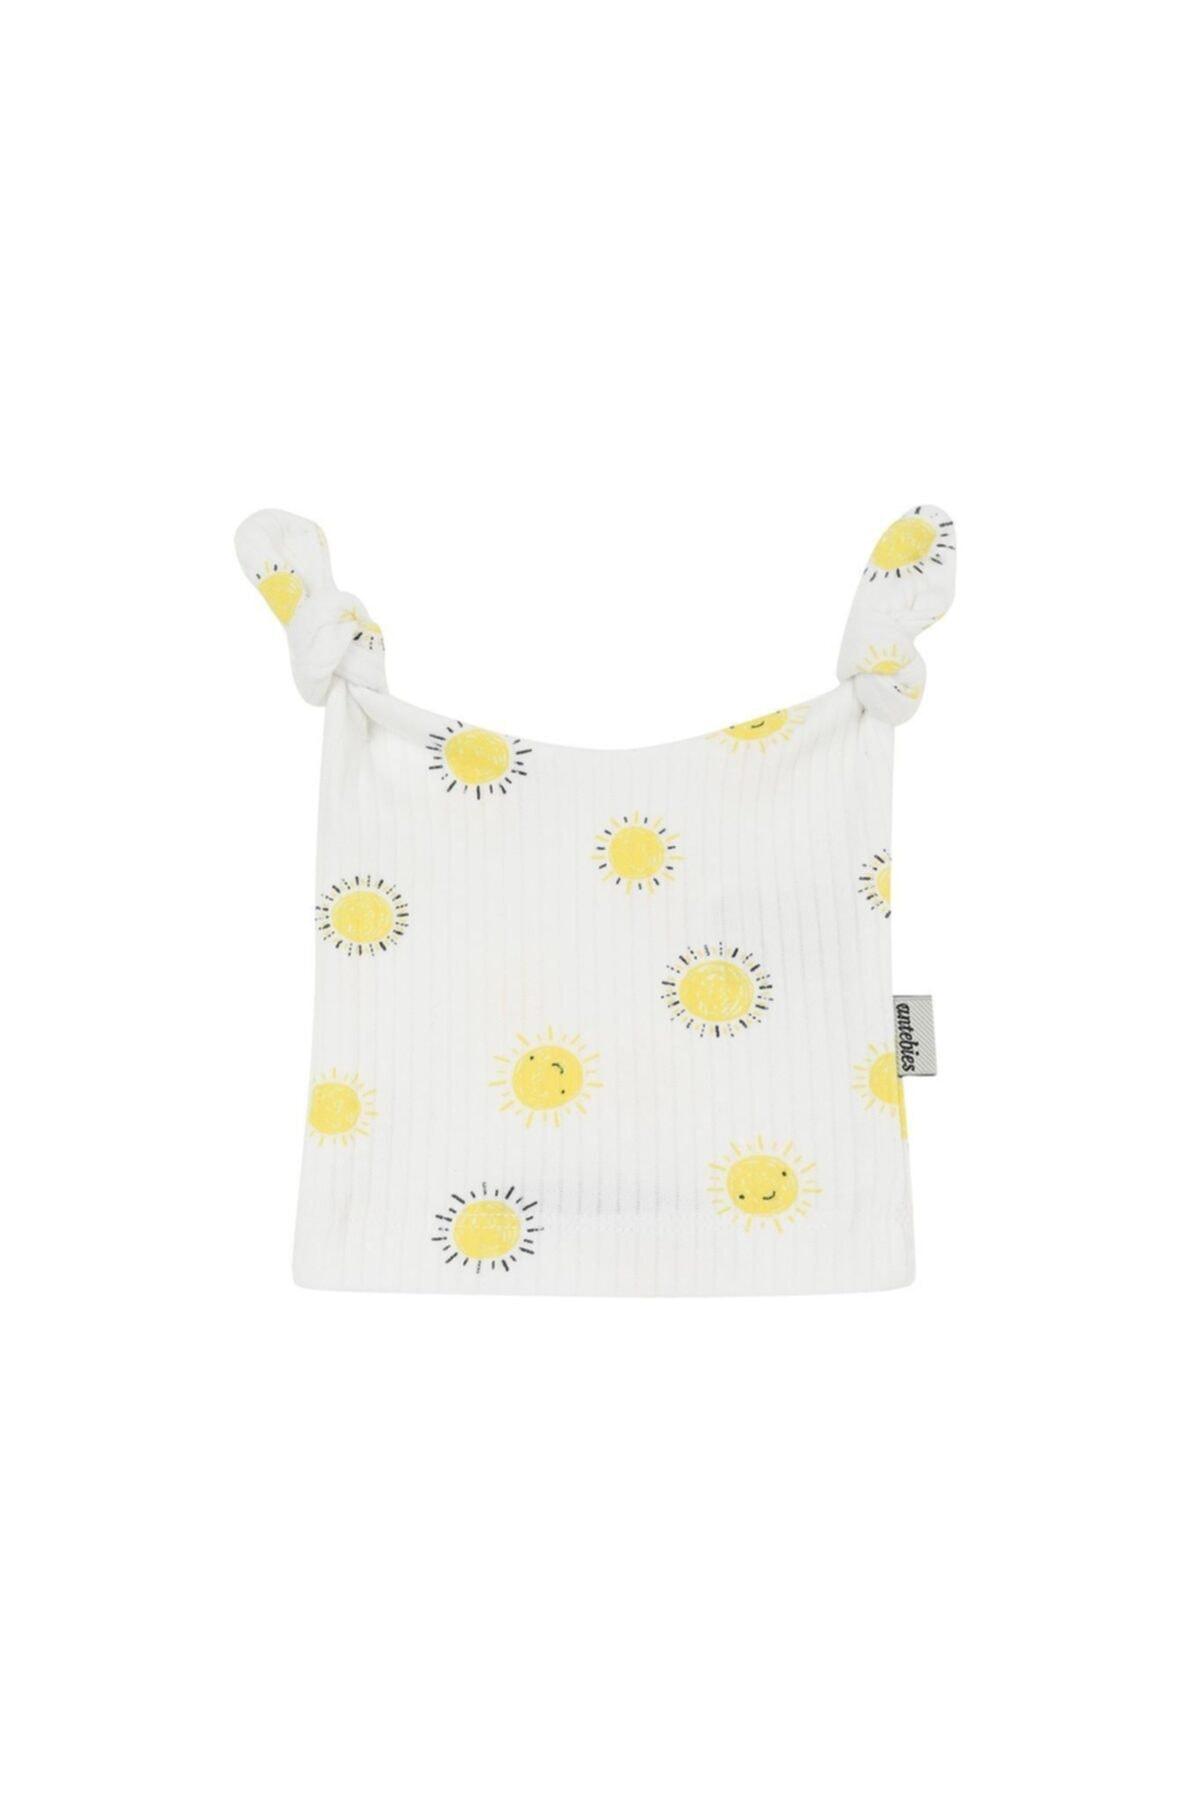 سرپوش نوزاد دختر ارزان برند antebies رنگ زرد ty85565839